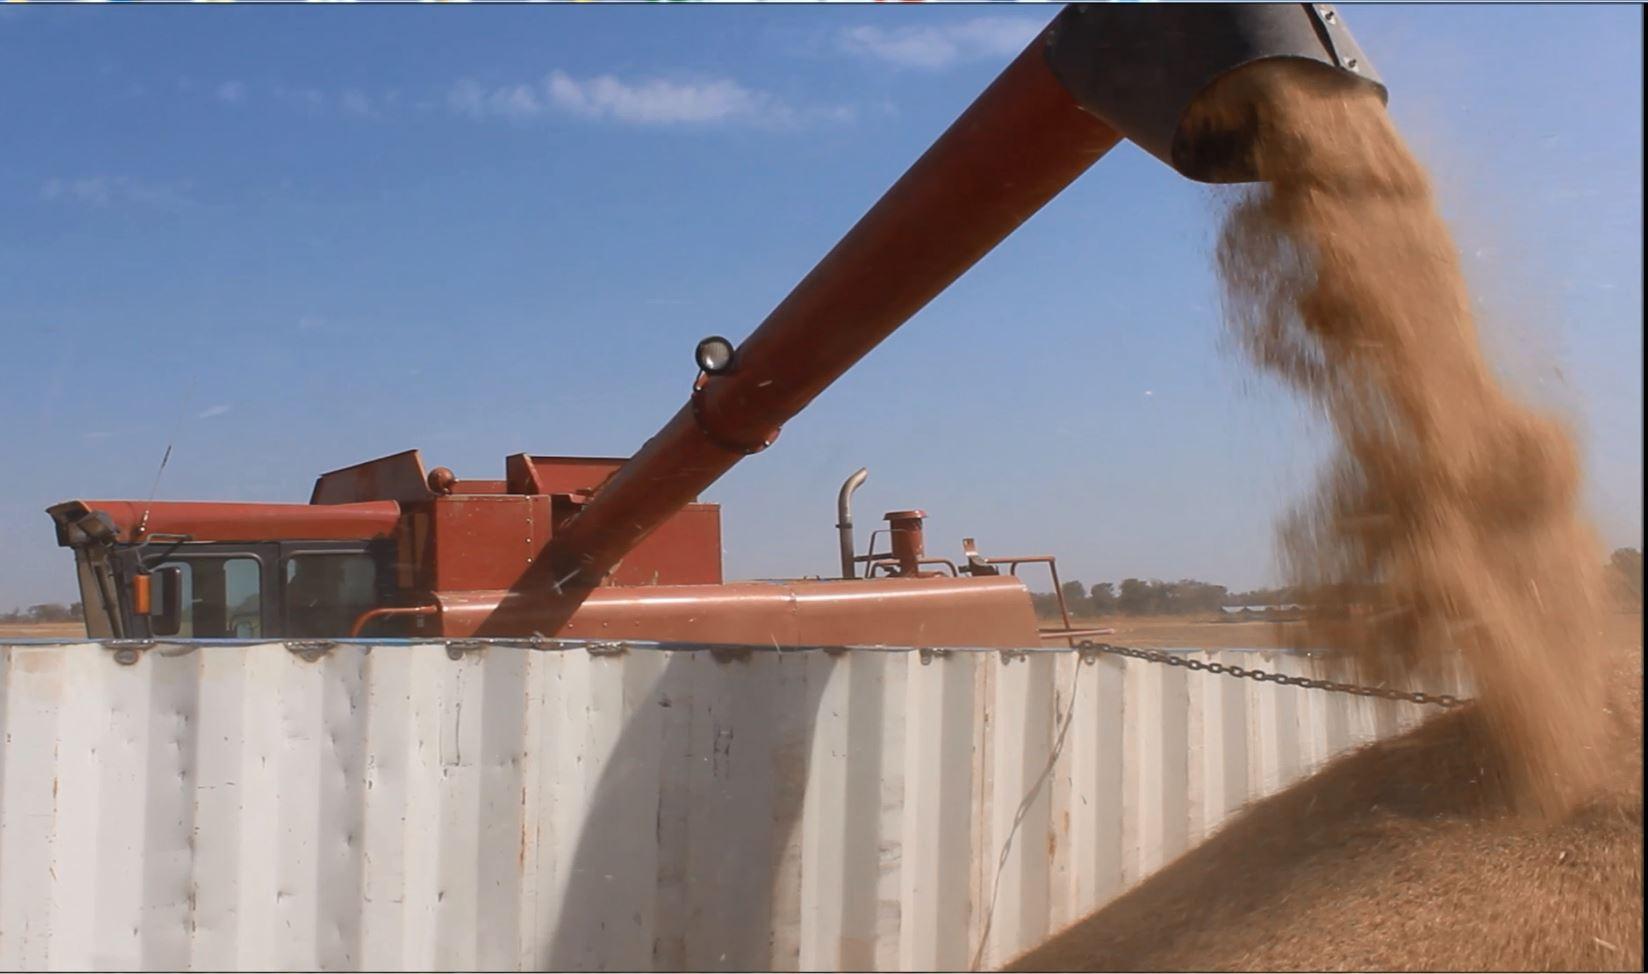 Harvesting the Crop